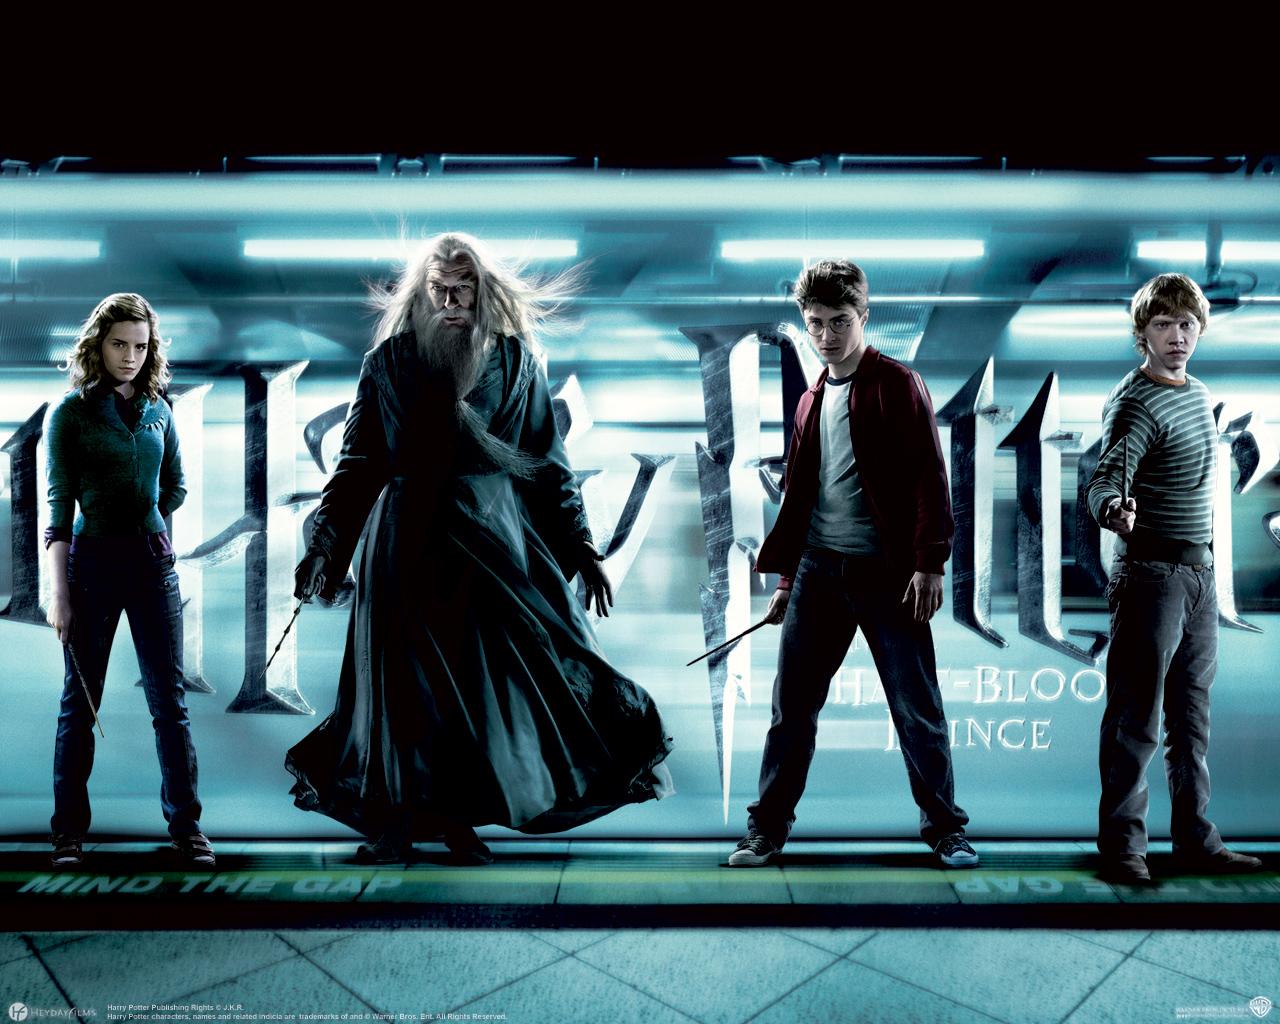 Desktop Wallpapers Harry Potter Harry Potter and the Half-Blood Prince Emma Watson Rupert Grint Daniel Radcliffe film Movies